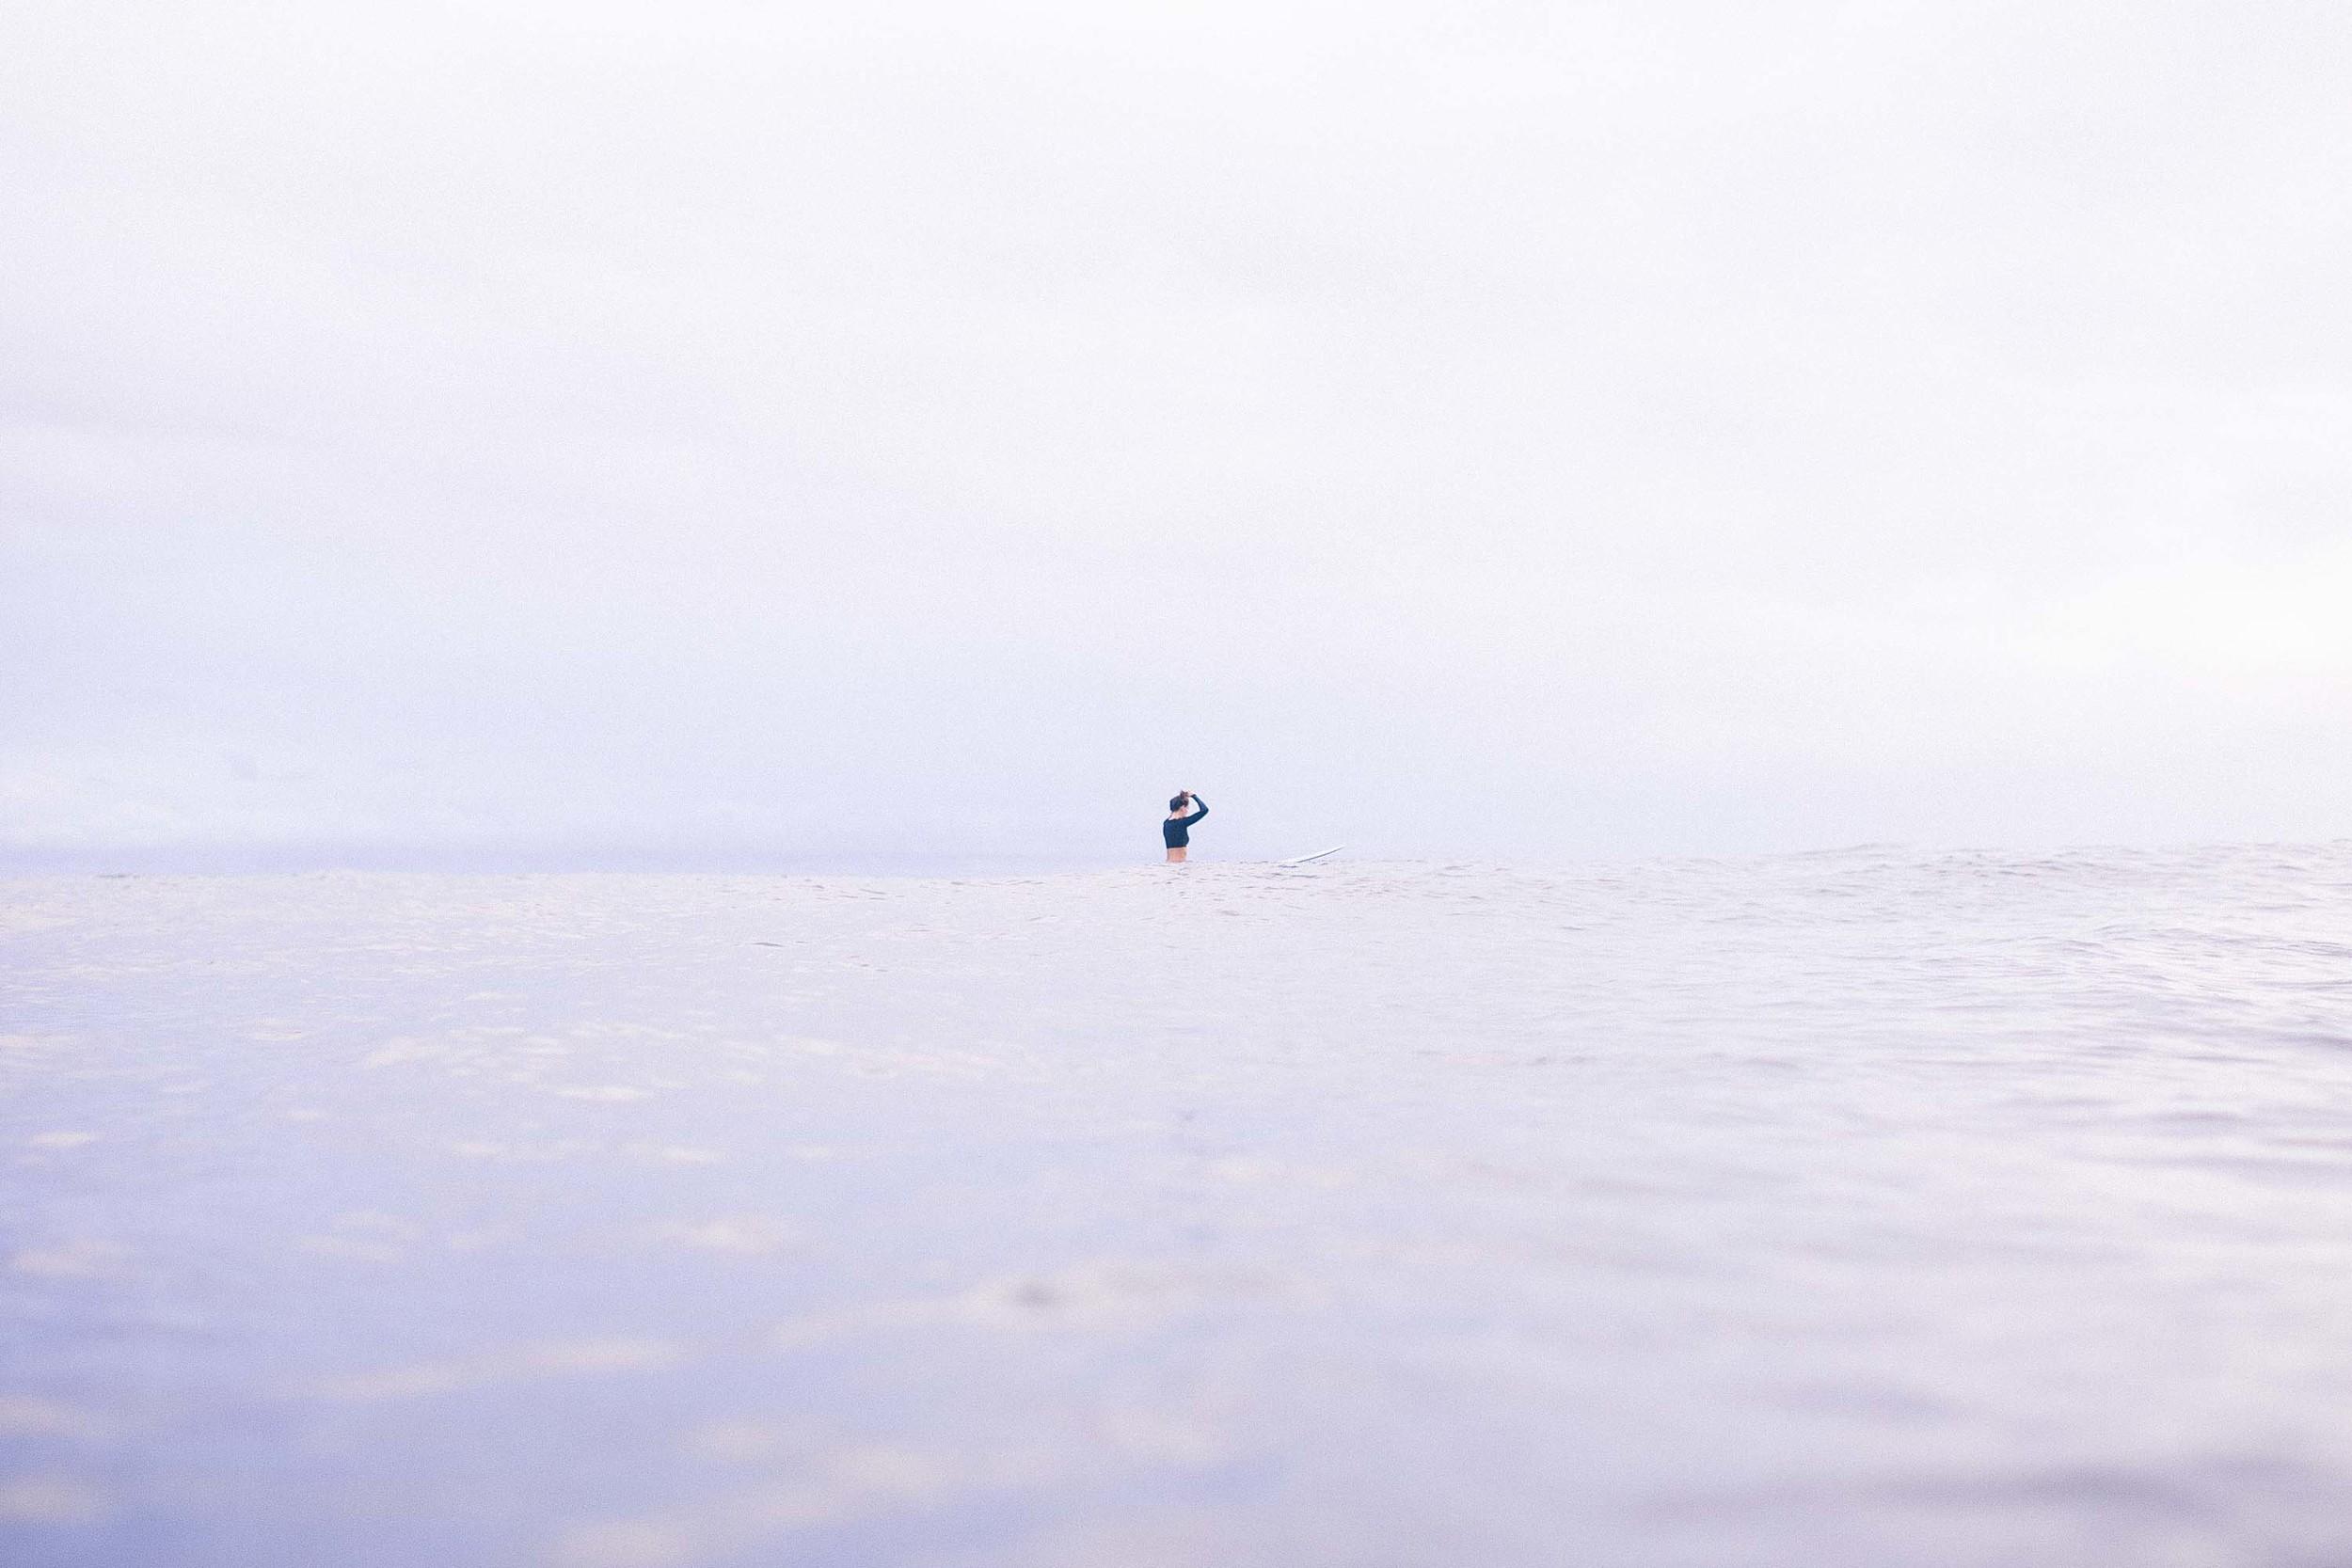 seea bryce johnson photography, hawaii, kauai, surfing, water, p